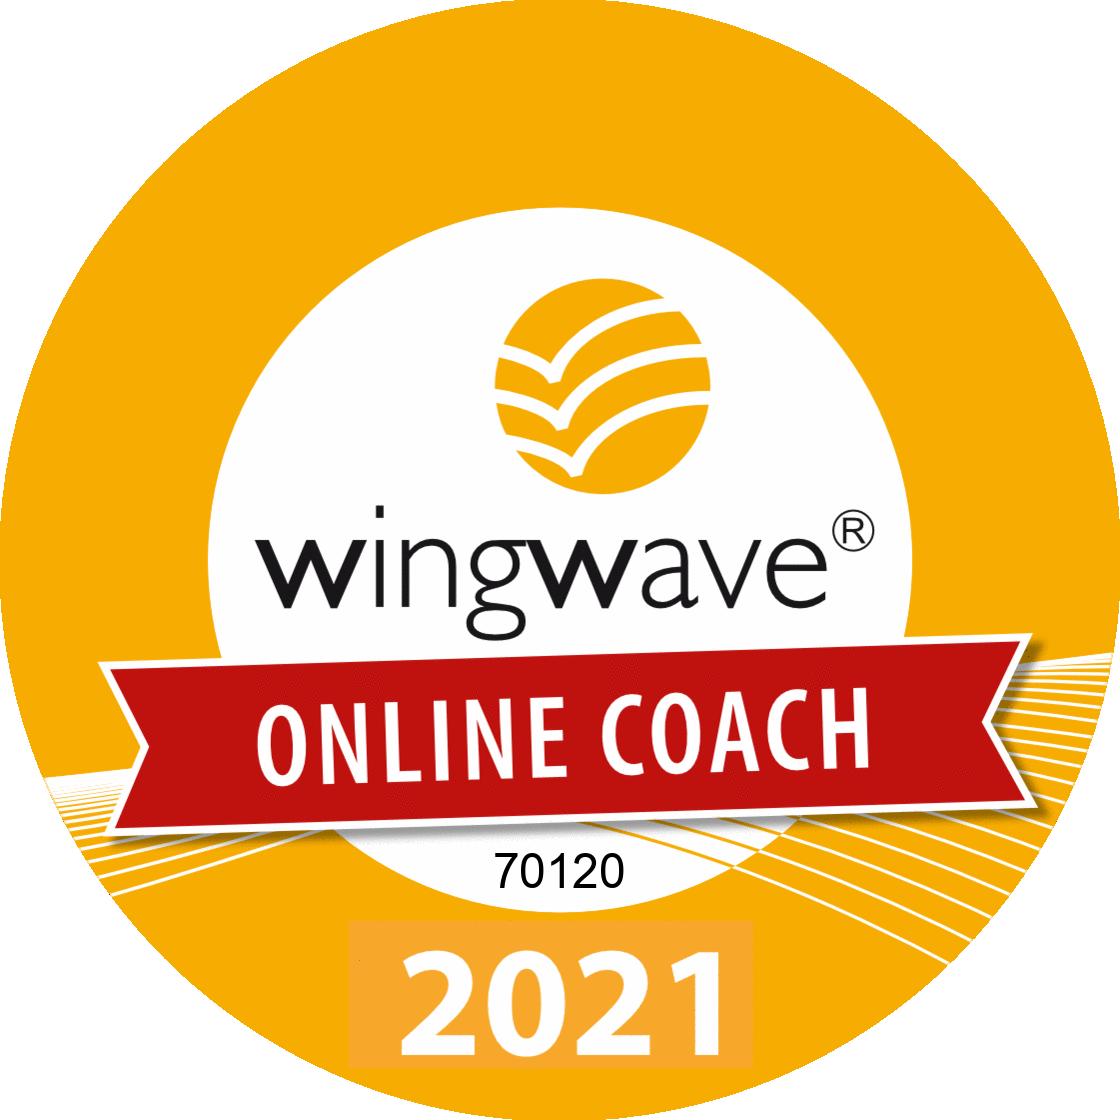 Ingrid Tonn-Euringer, wingwave-Online-Coach, Wiesbaden